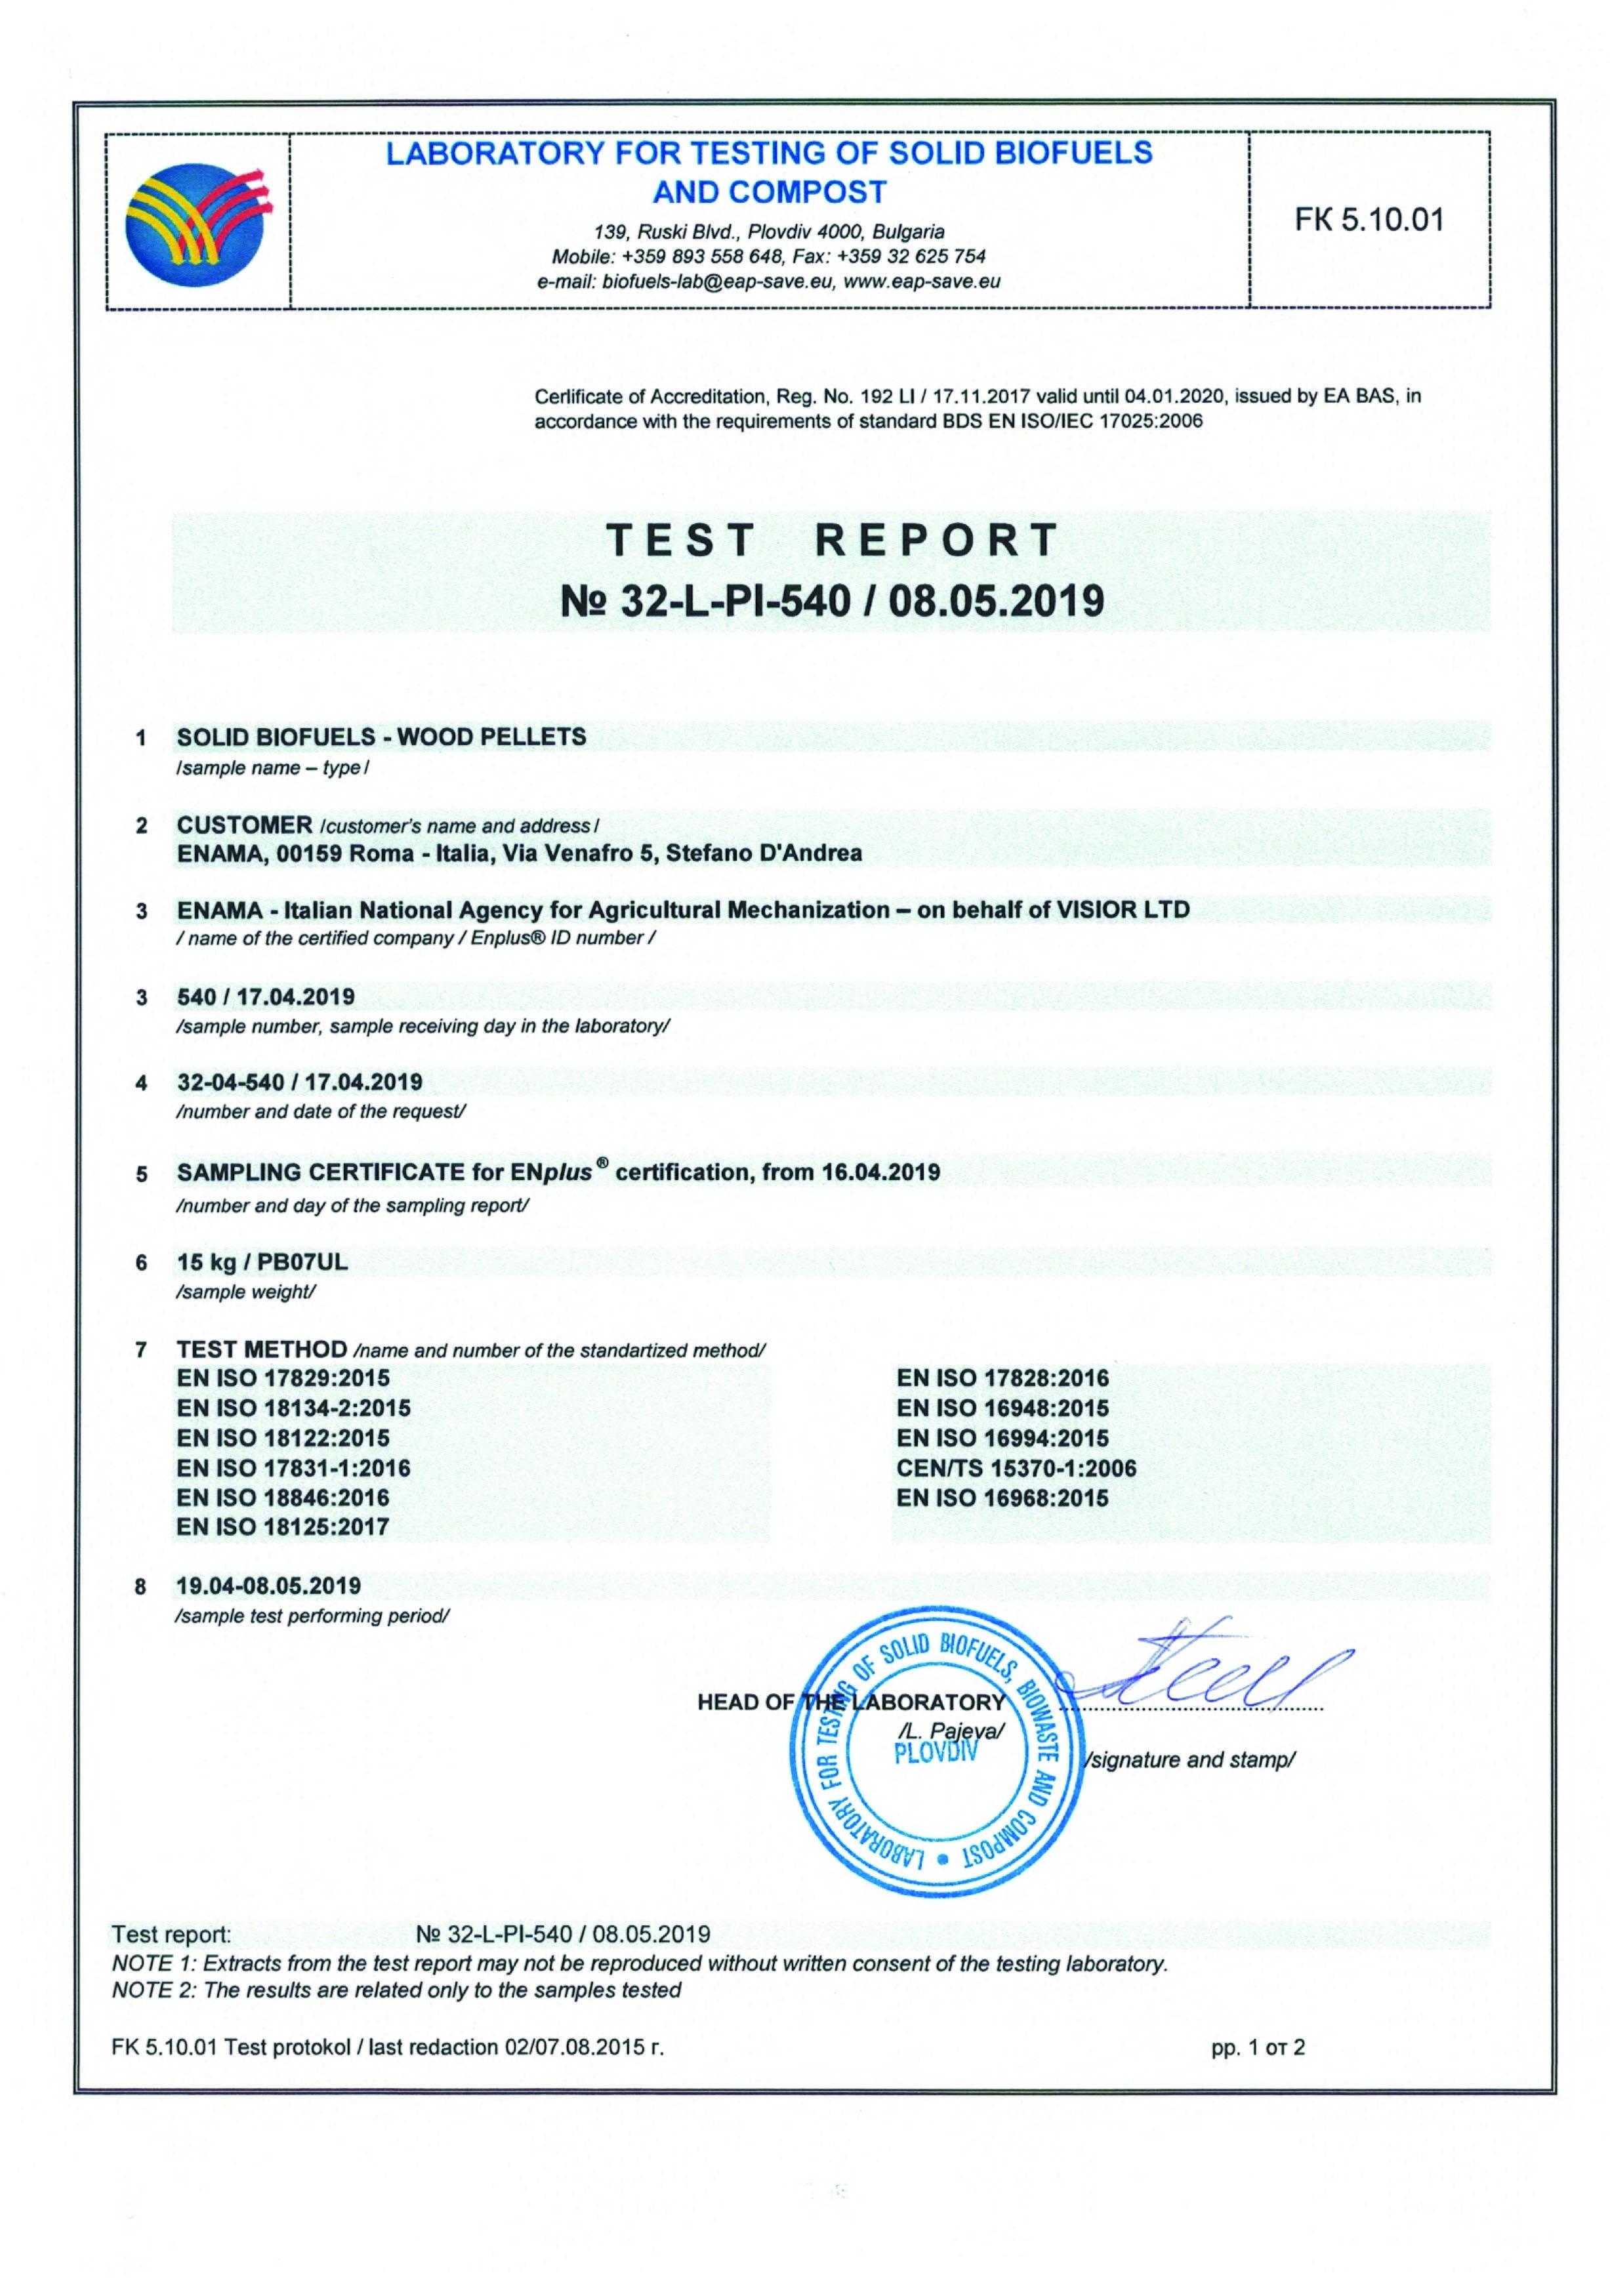 Test report sample 540 PB07UL scan 1